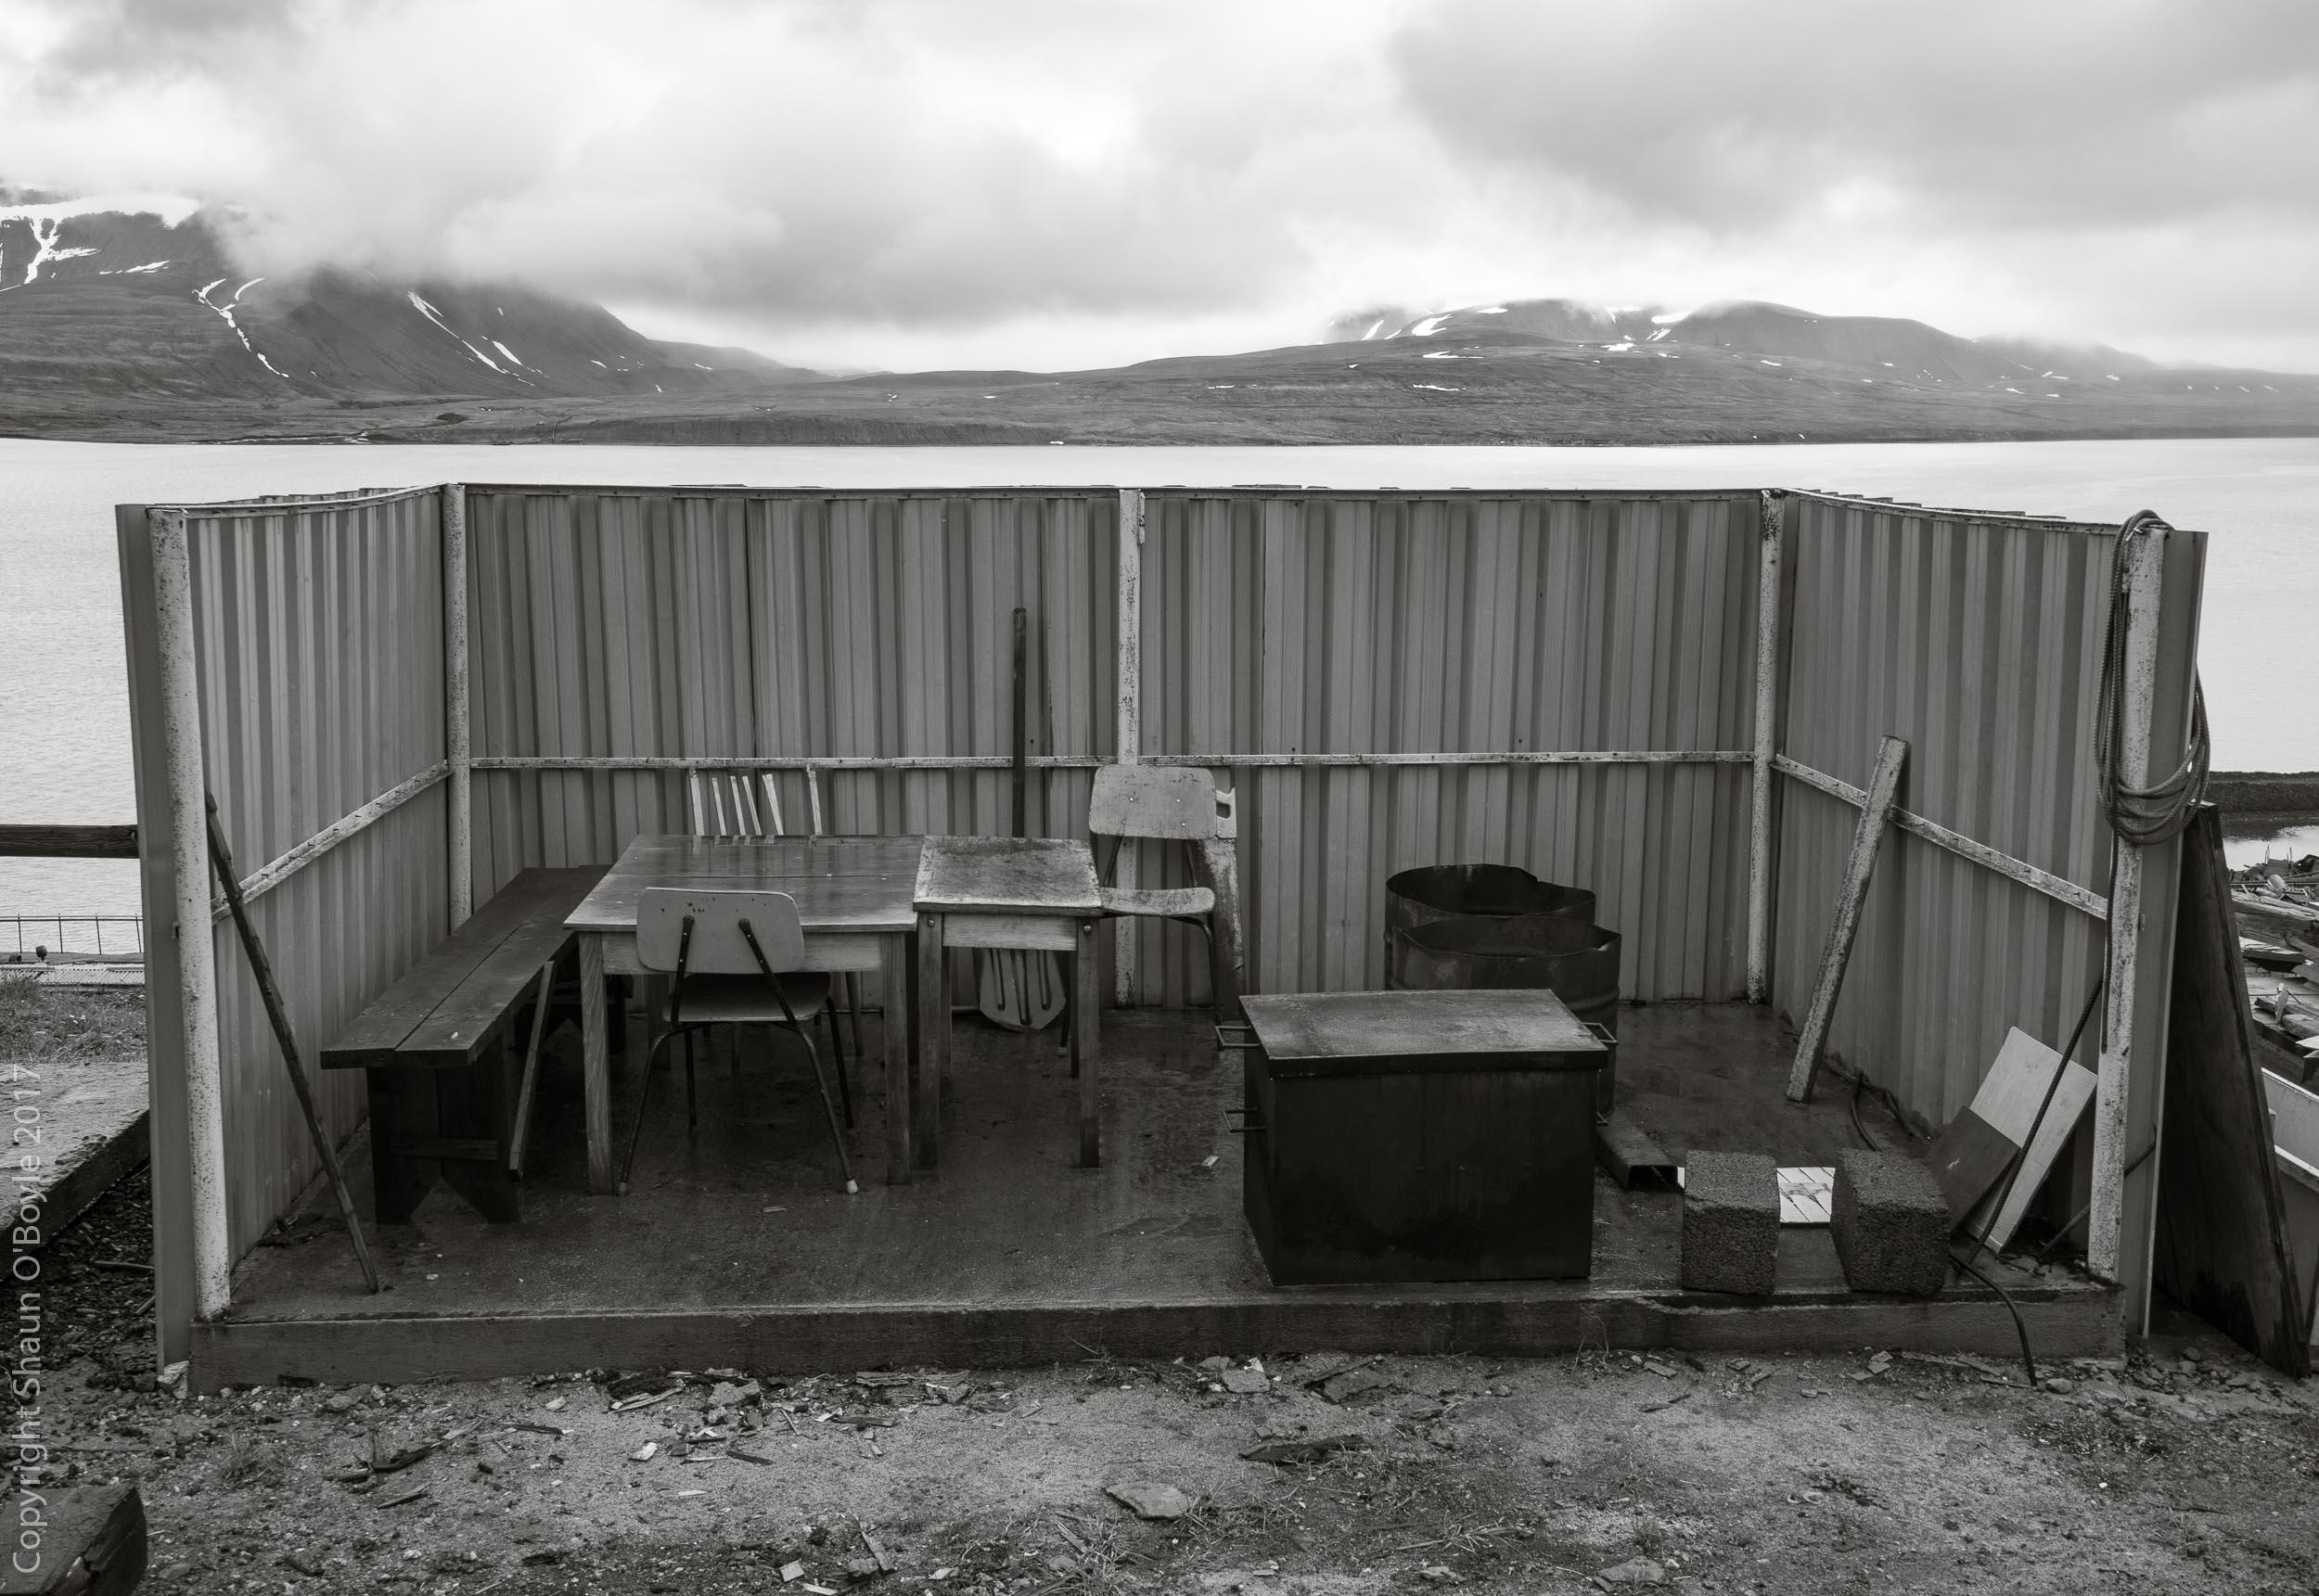 Barentsburg, Svalbard, Norway.